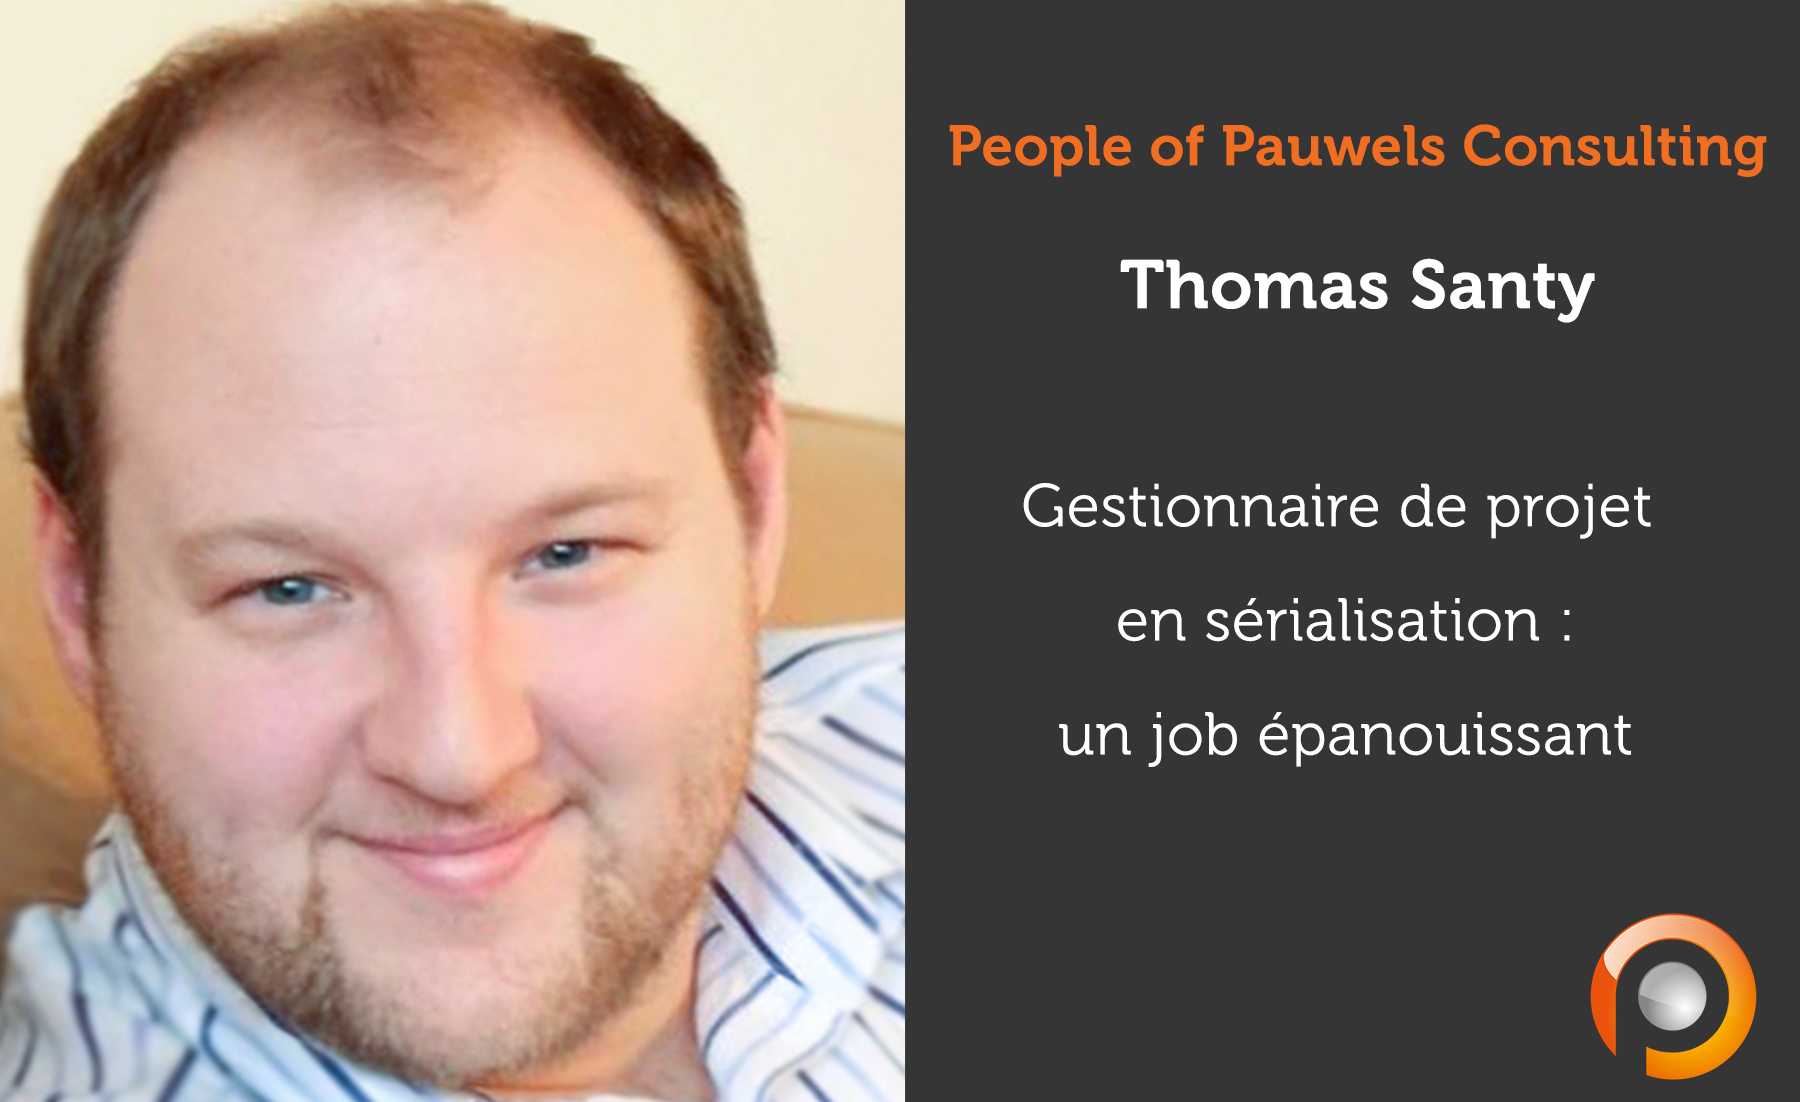 people-of-pauwels-consulting-thomas-santy-fr-li